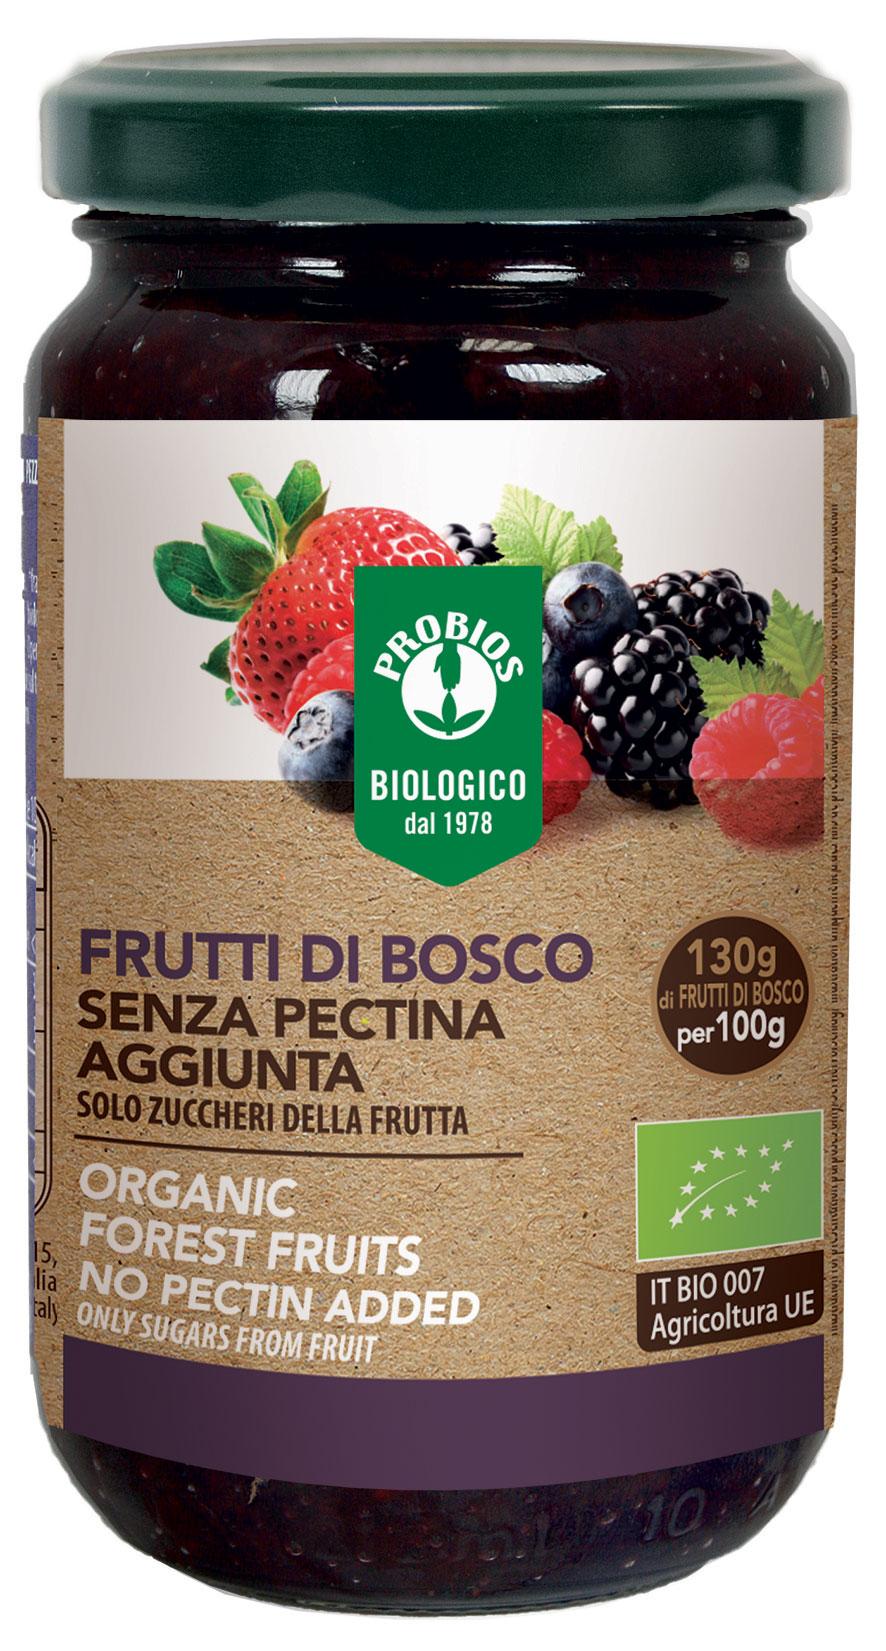 Probios Composta Di Frutti Di Bosco Senza Pectina Biologica 220g